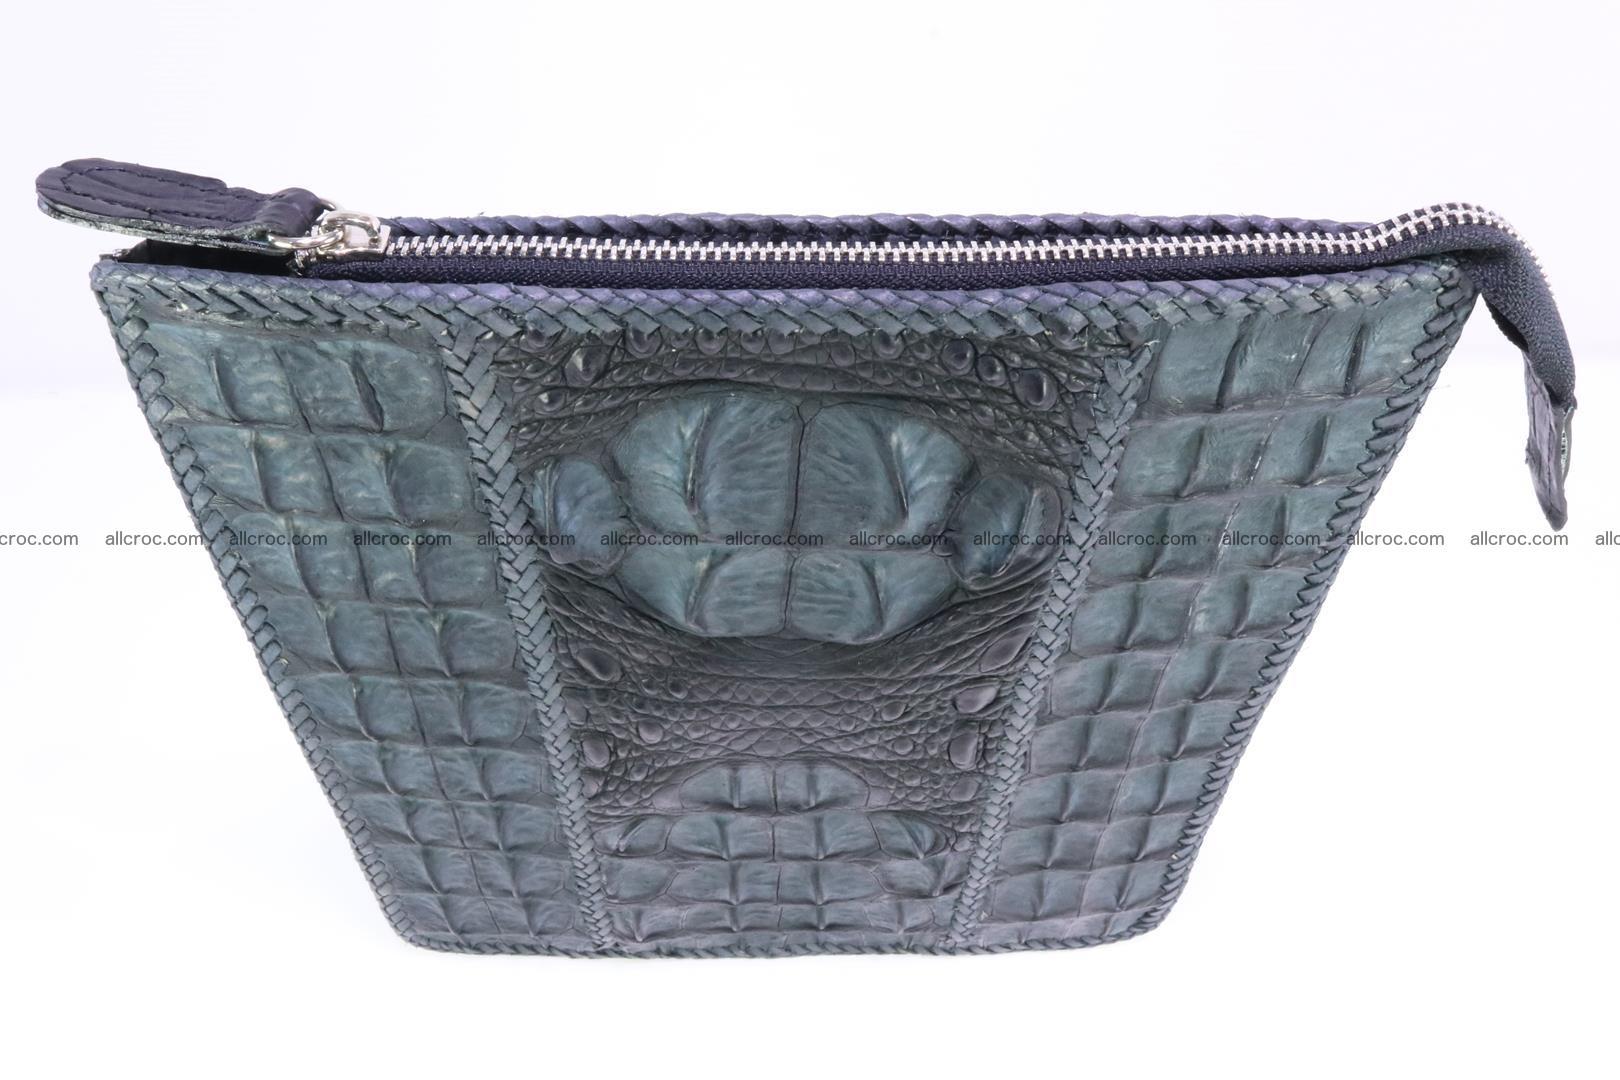 Crocodile skin shoulder bag hand braided edges 130 Foto 4